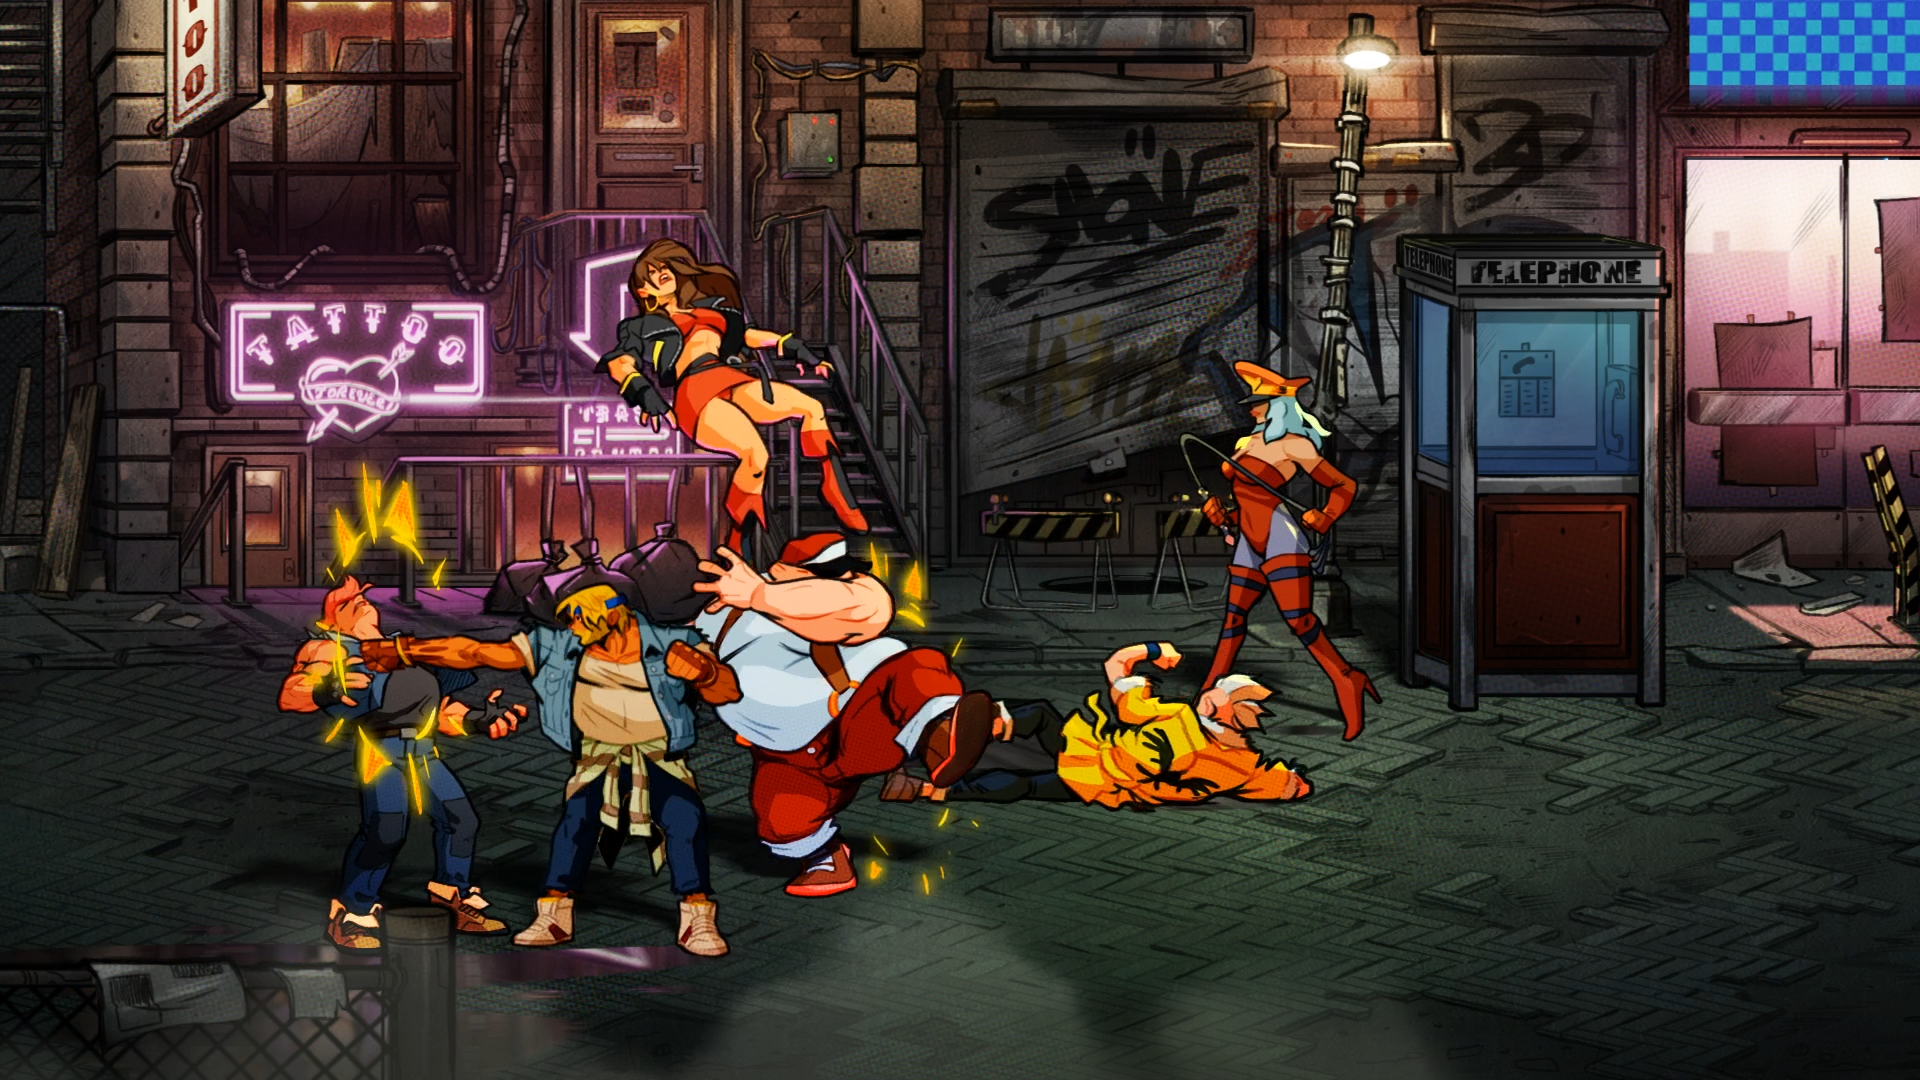 Streets of Rage 4 looks bad